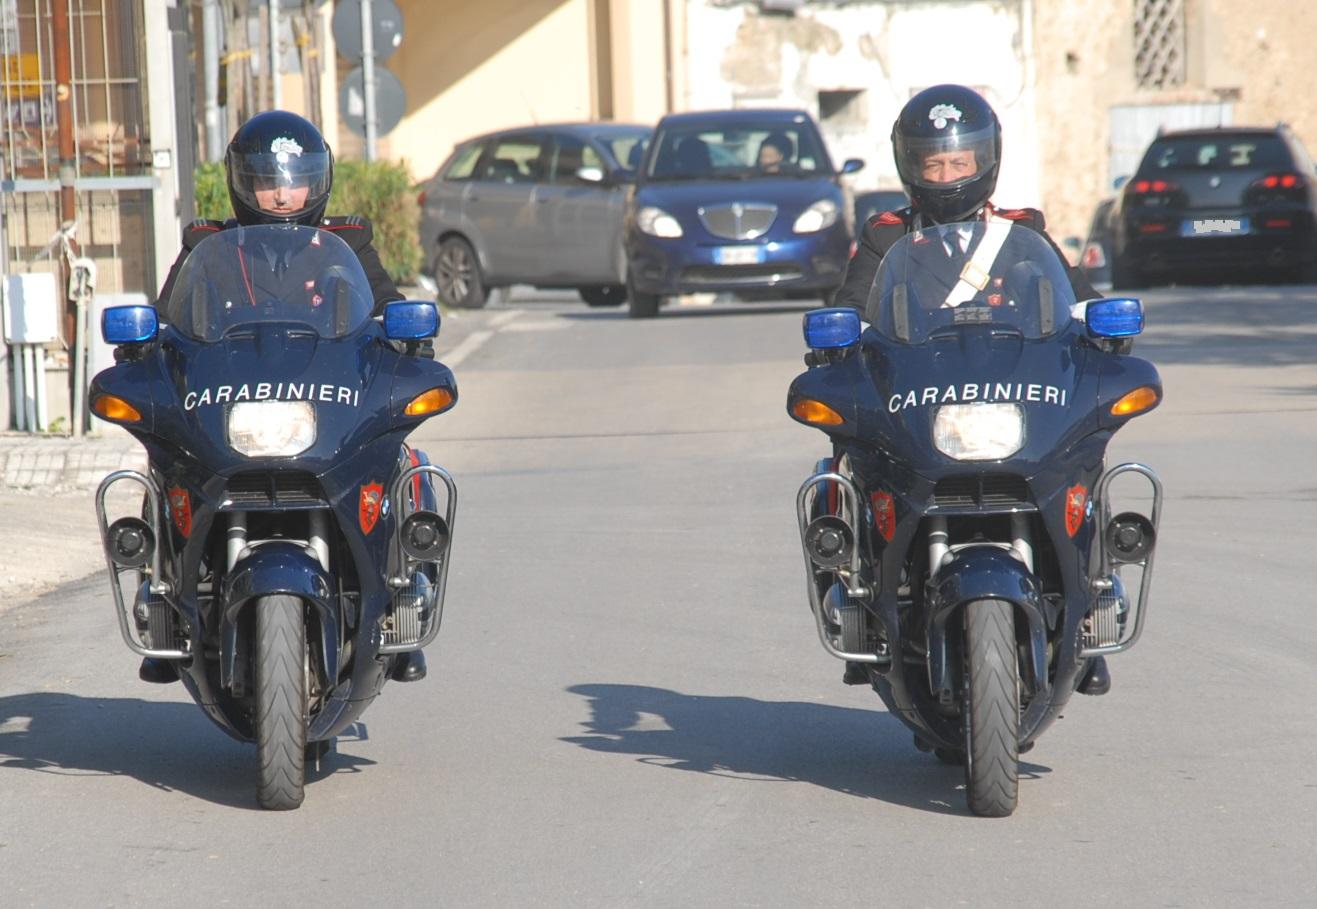 Carabinieri moto trapani